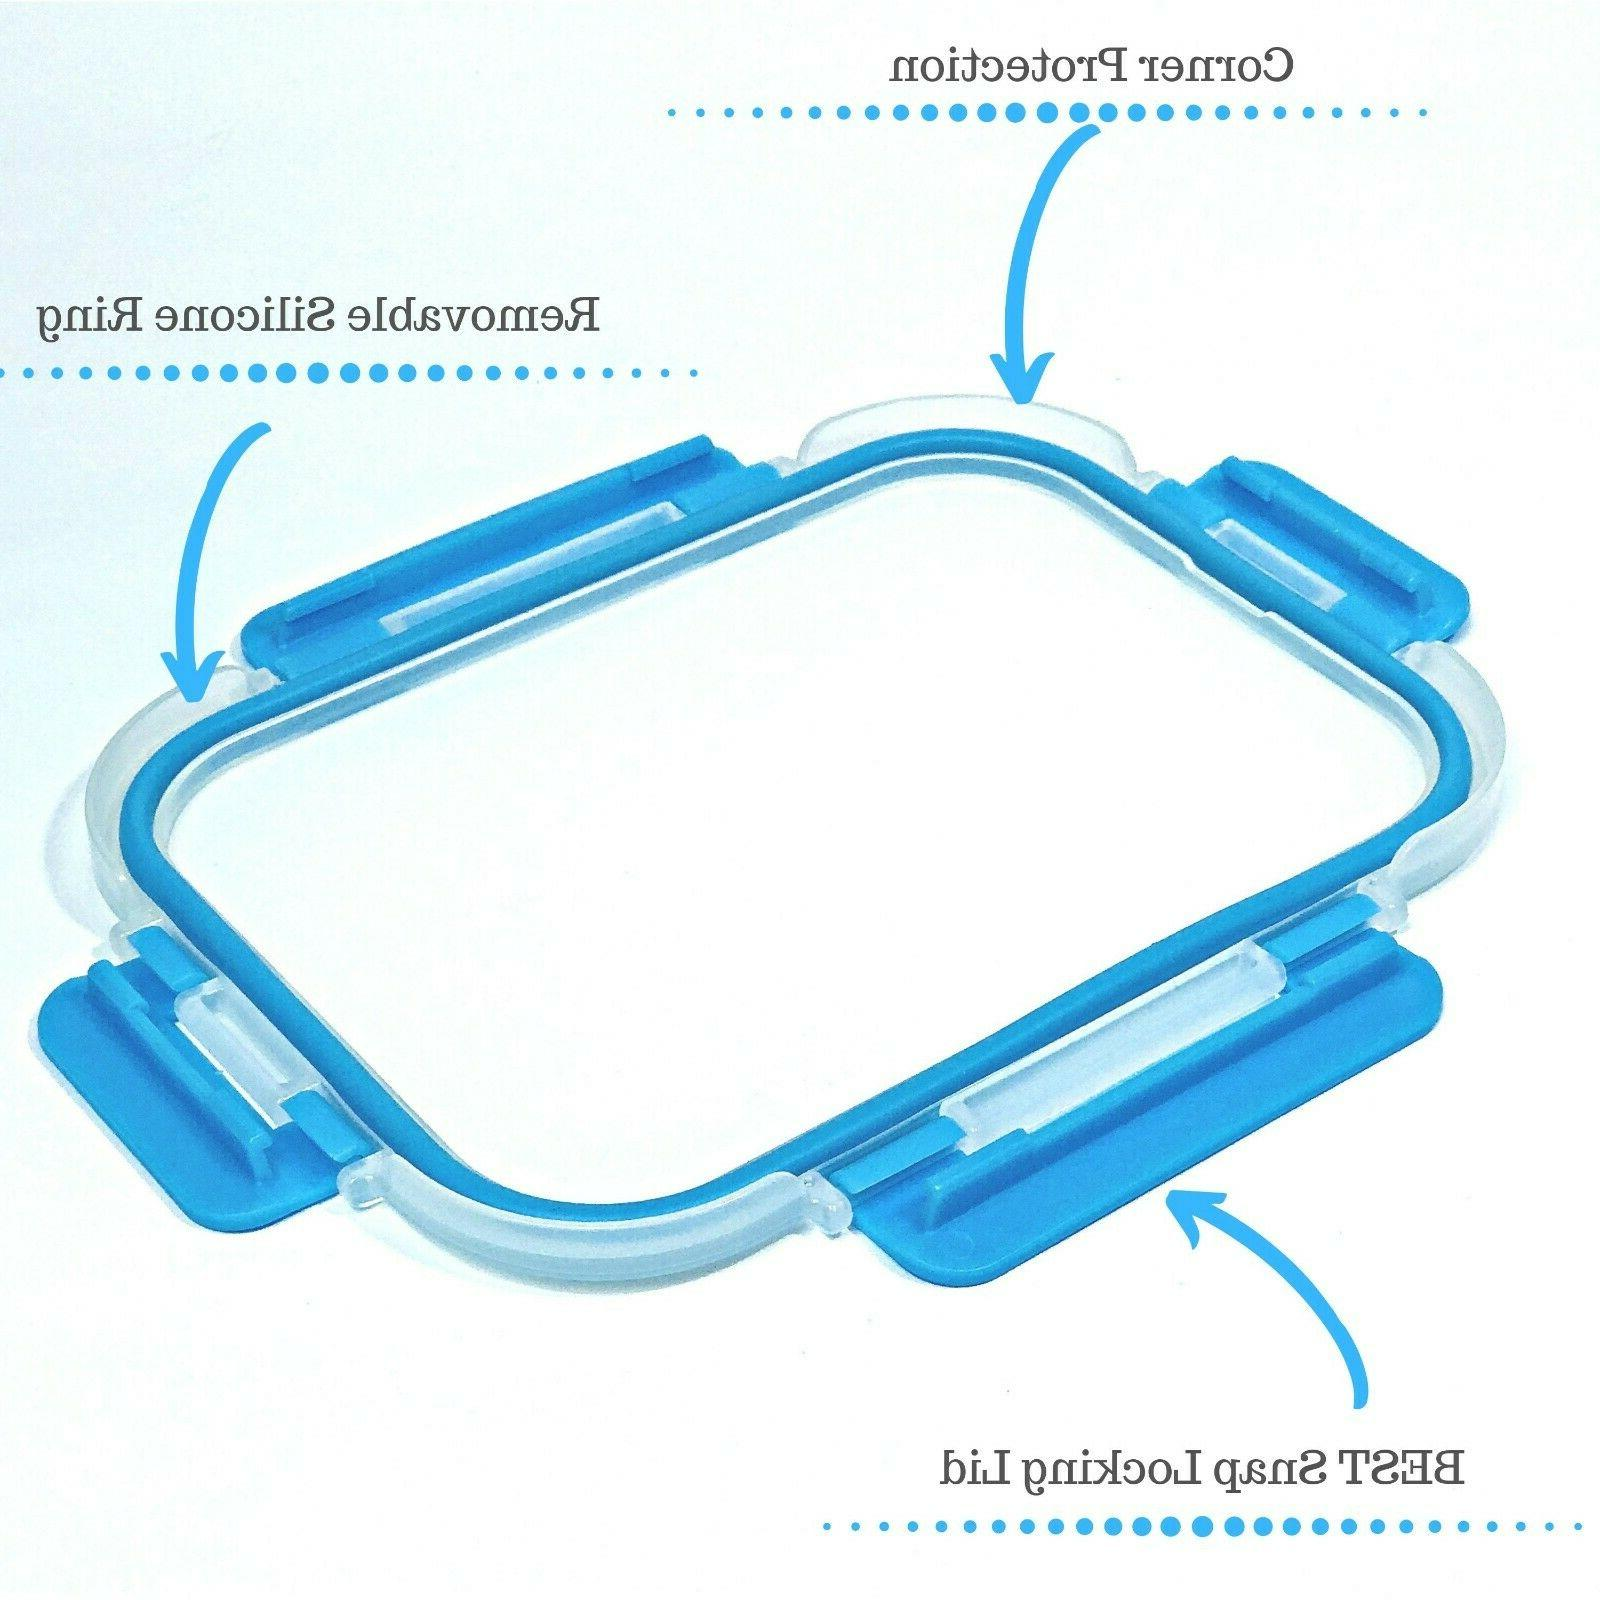 Glass - 1 35 Oz 5 Pack